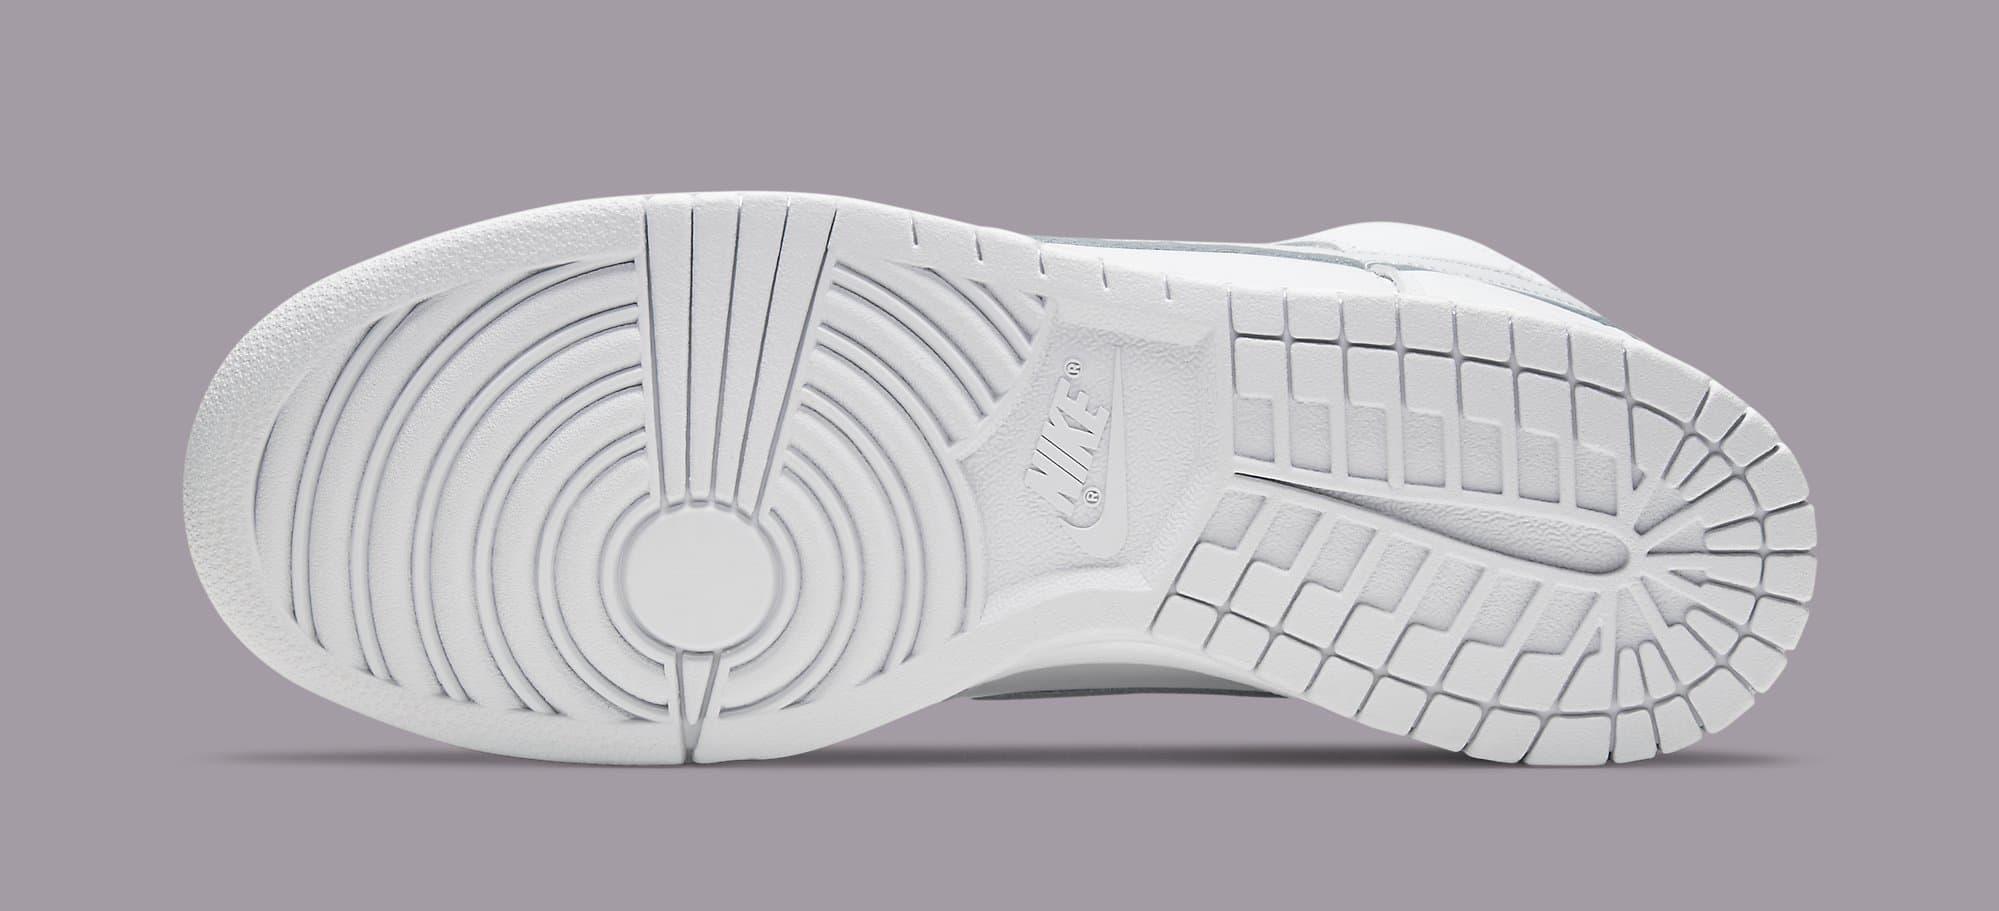 Nike Dunk High 'Pure Platinum' CZ8149-101 Outsole